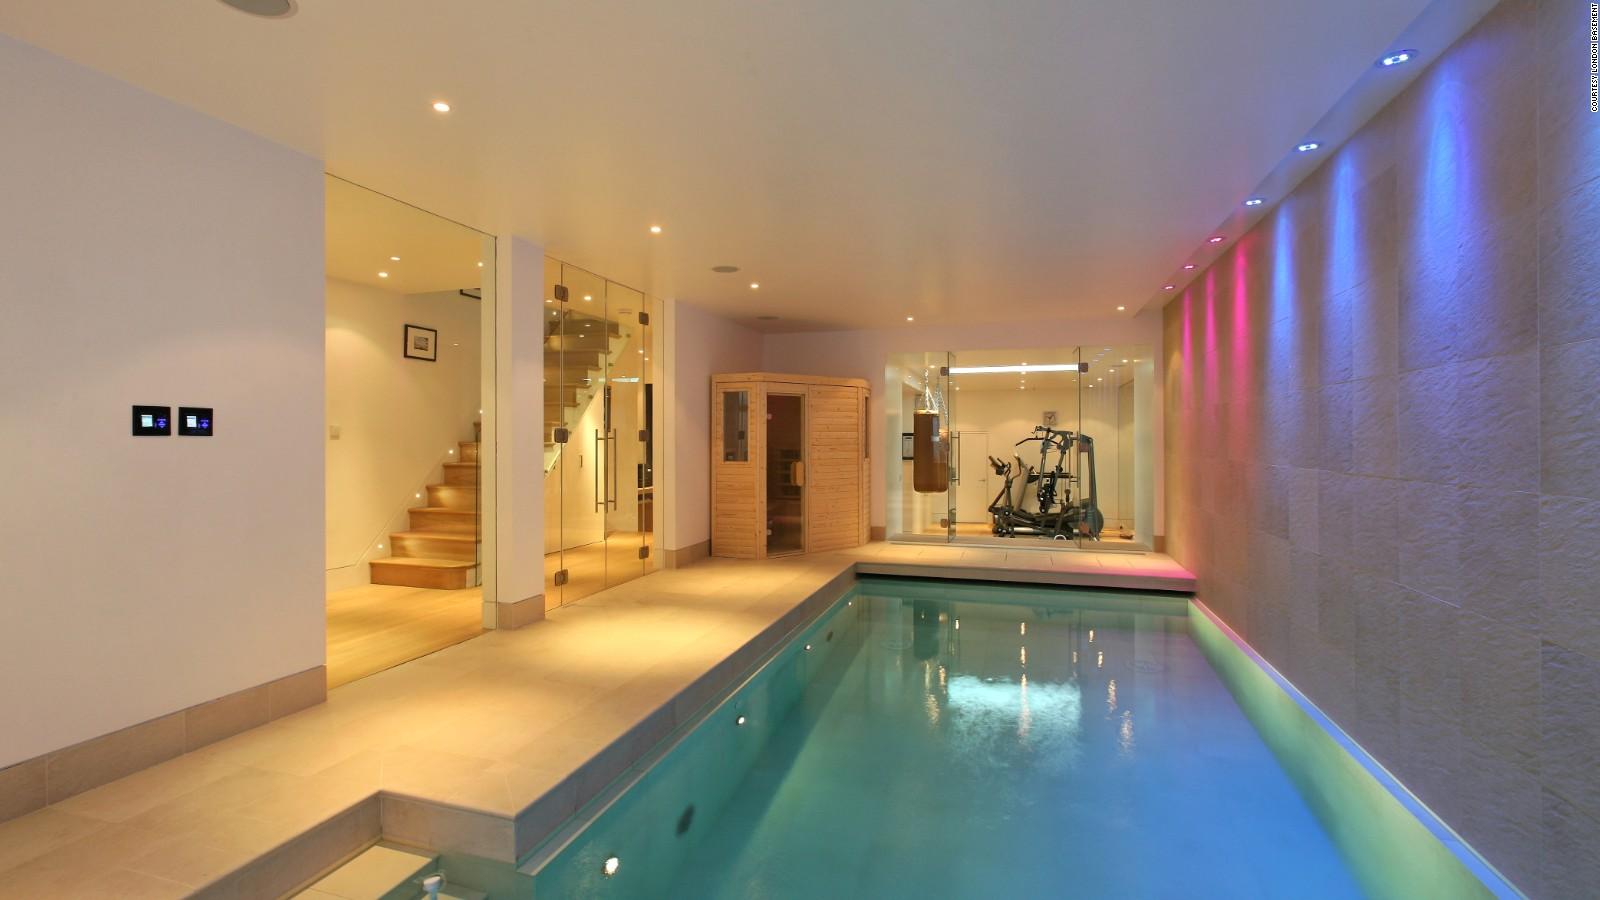 Basement Ideas Images Property london's amazing luxury basements - cnn style